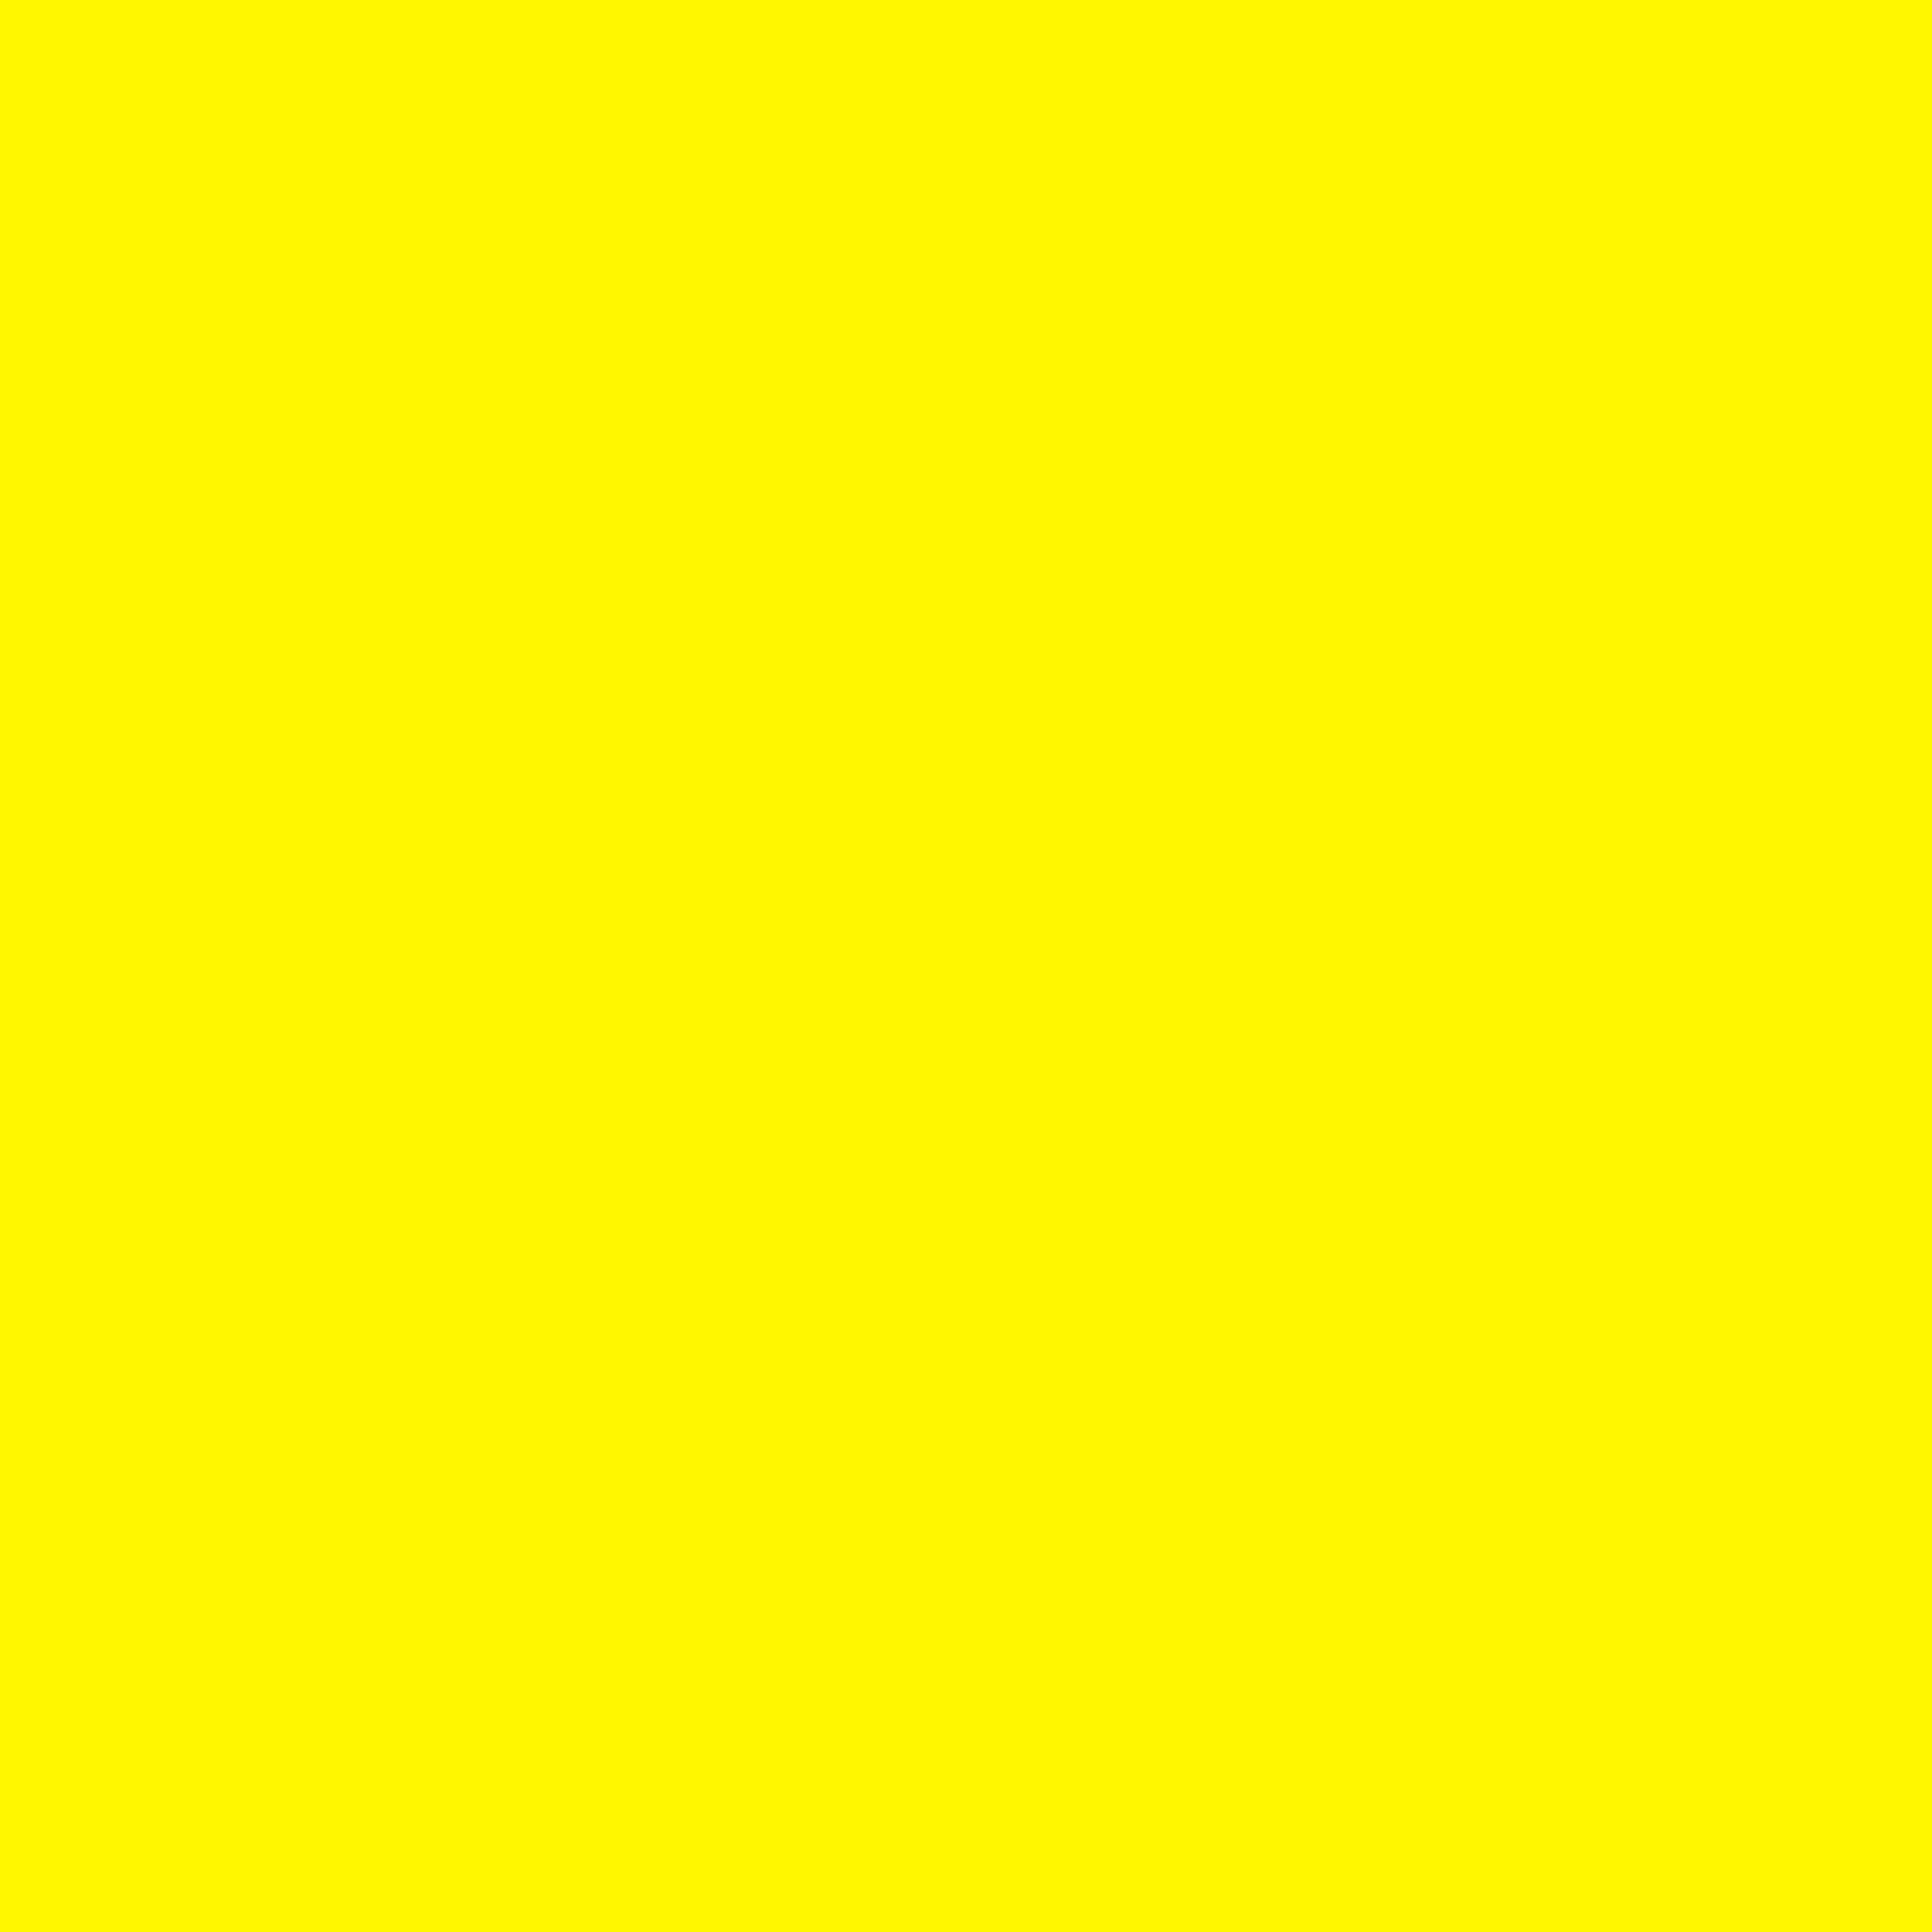 3600x3600 Lemon Solid Color Background